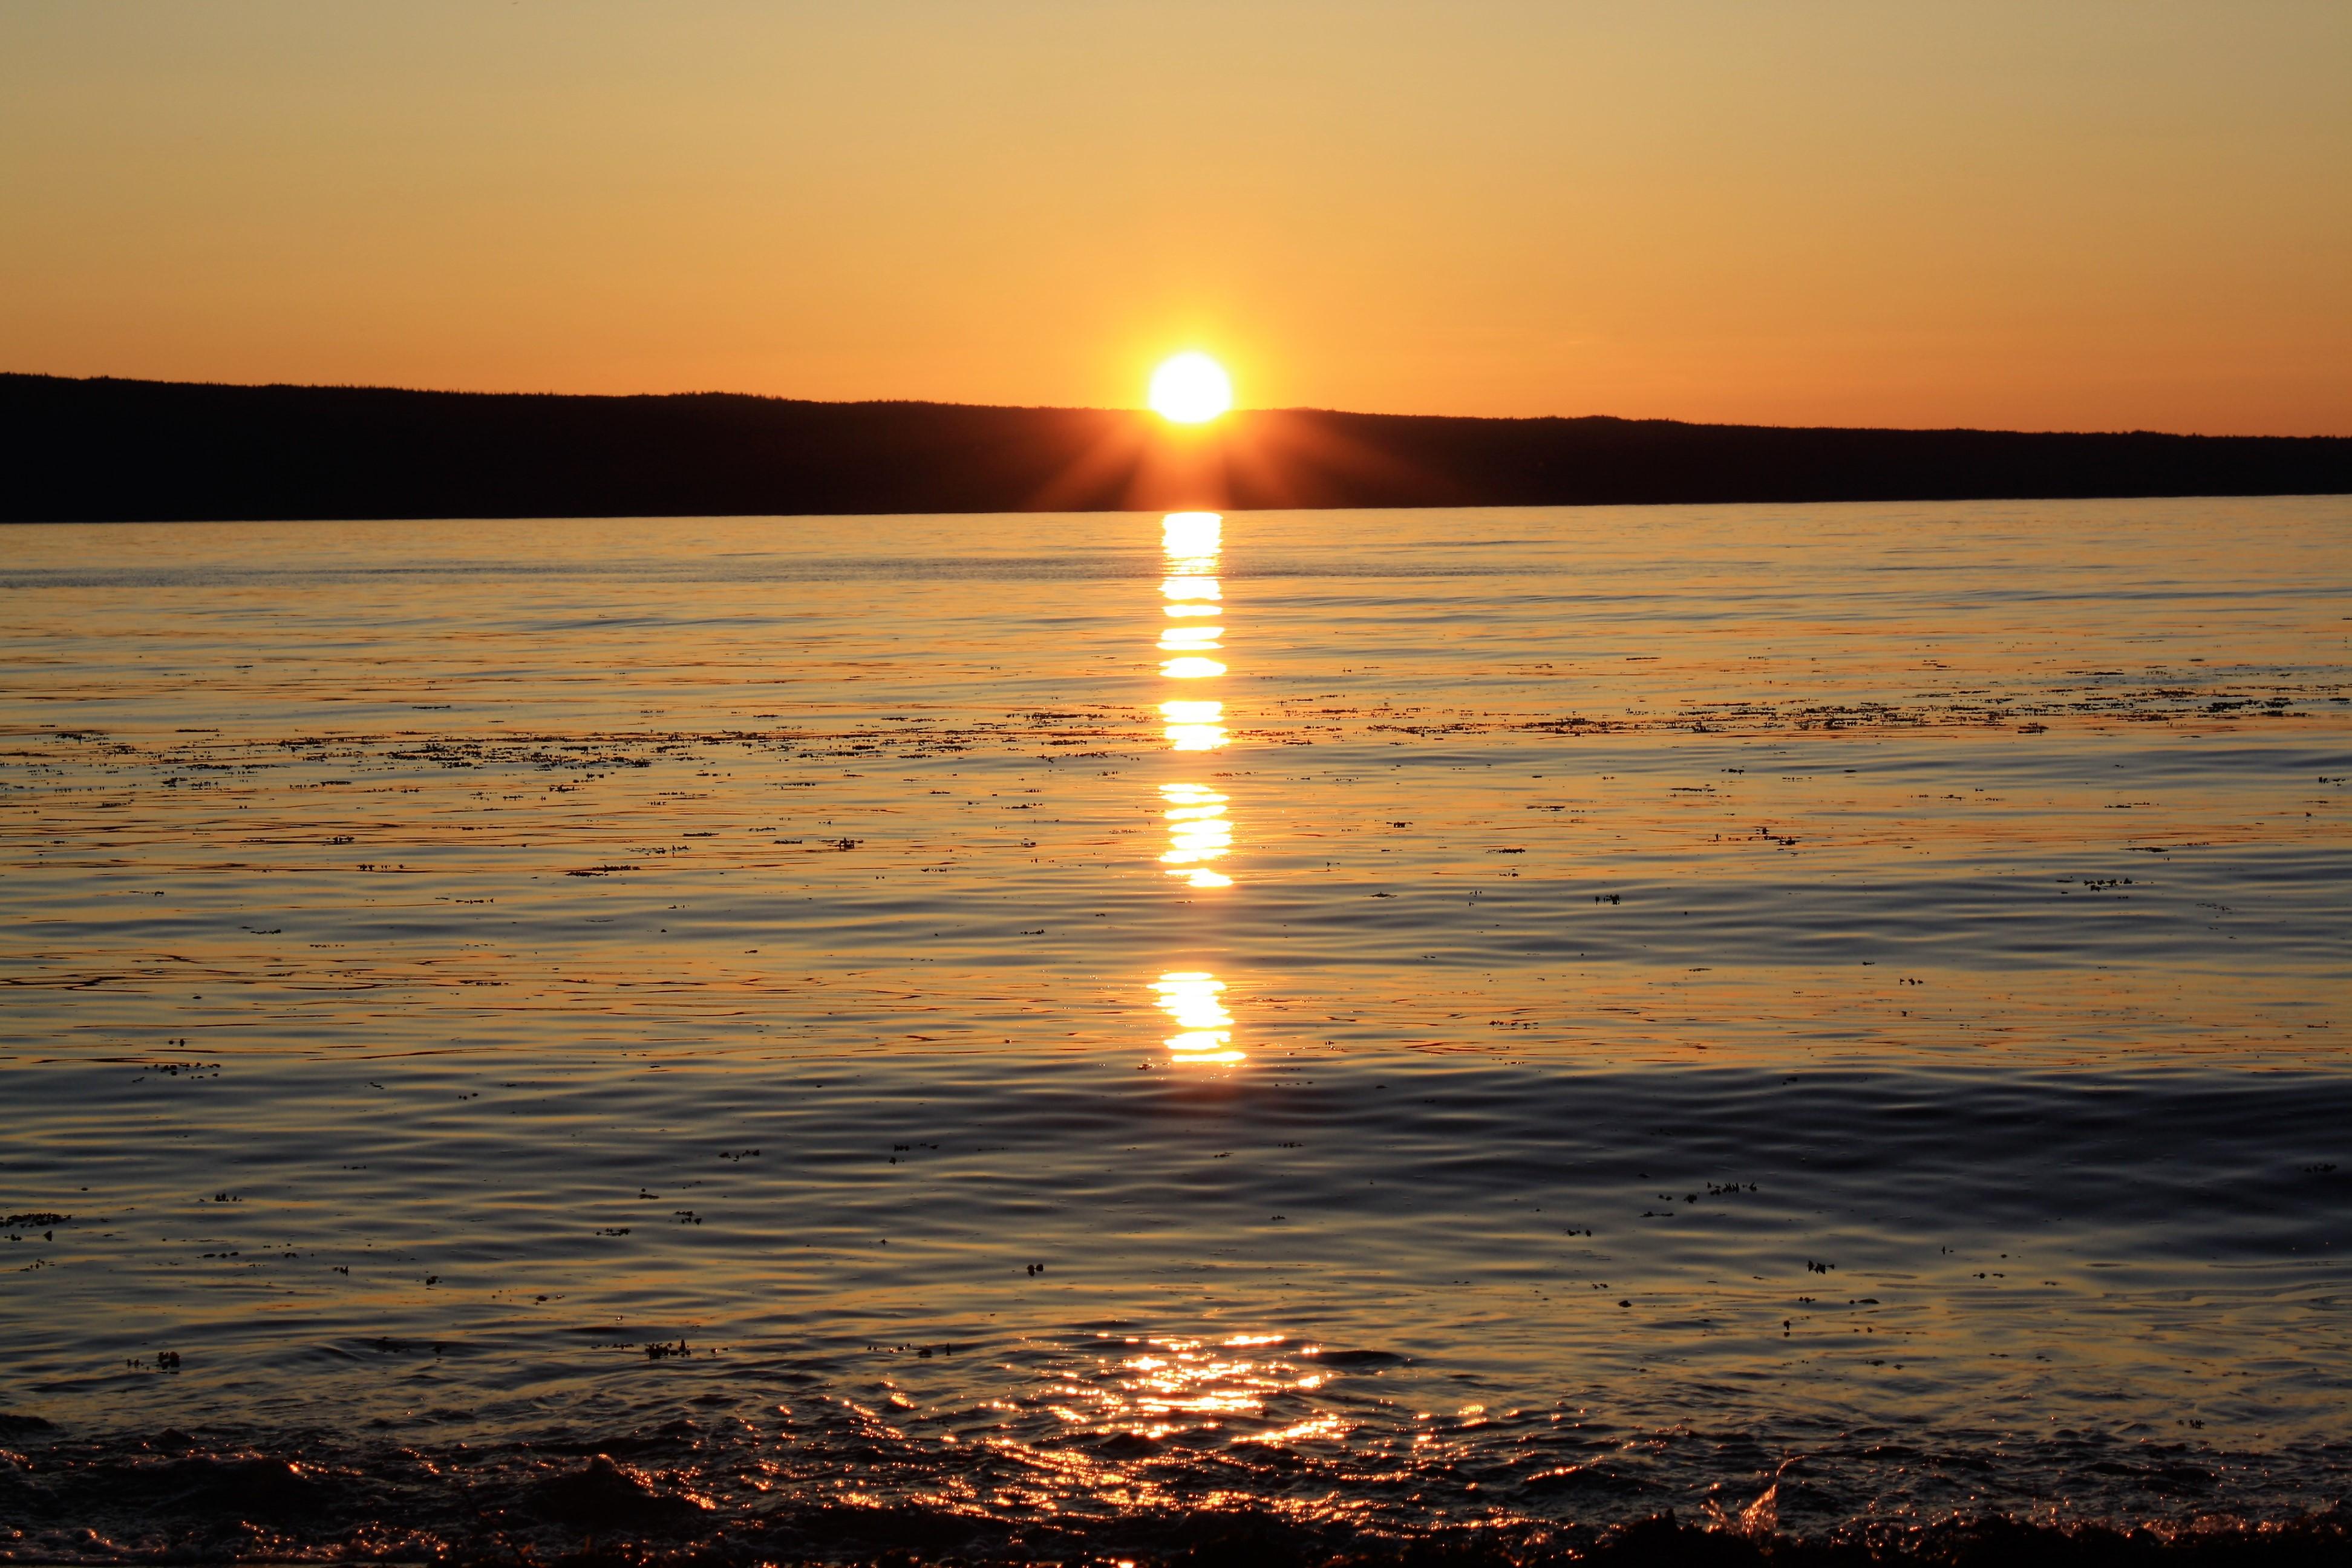 DM_nature_sunsetssunrises_haidagwaii_344